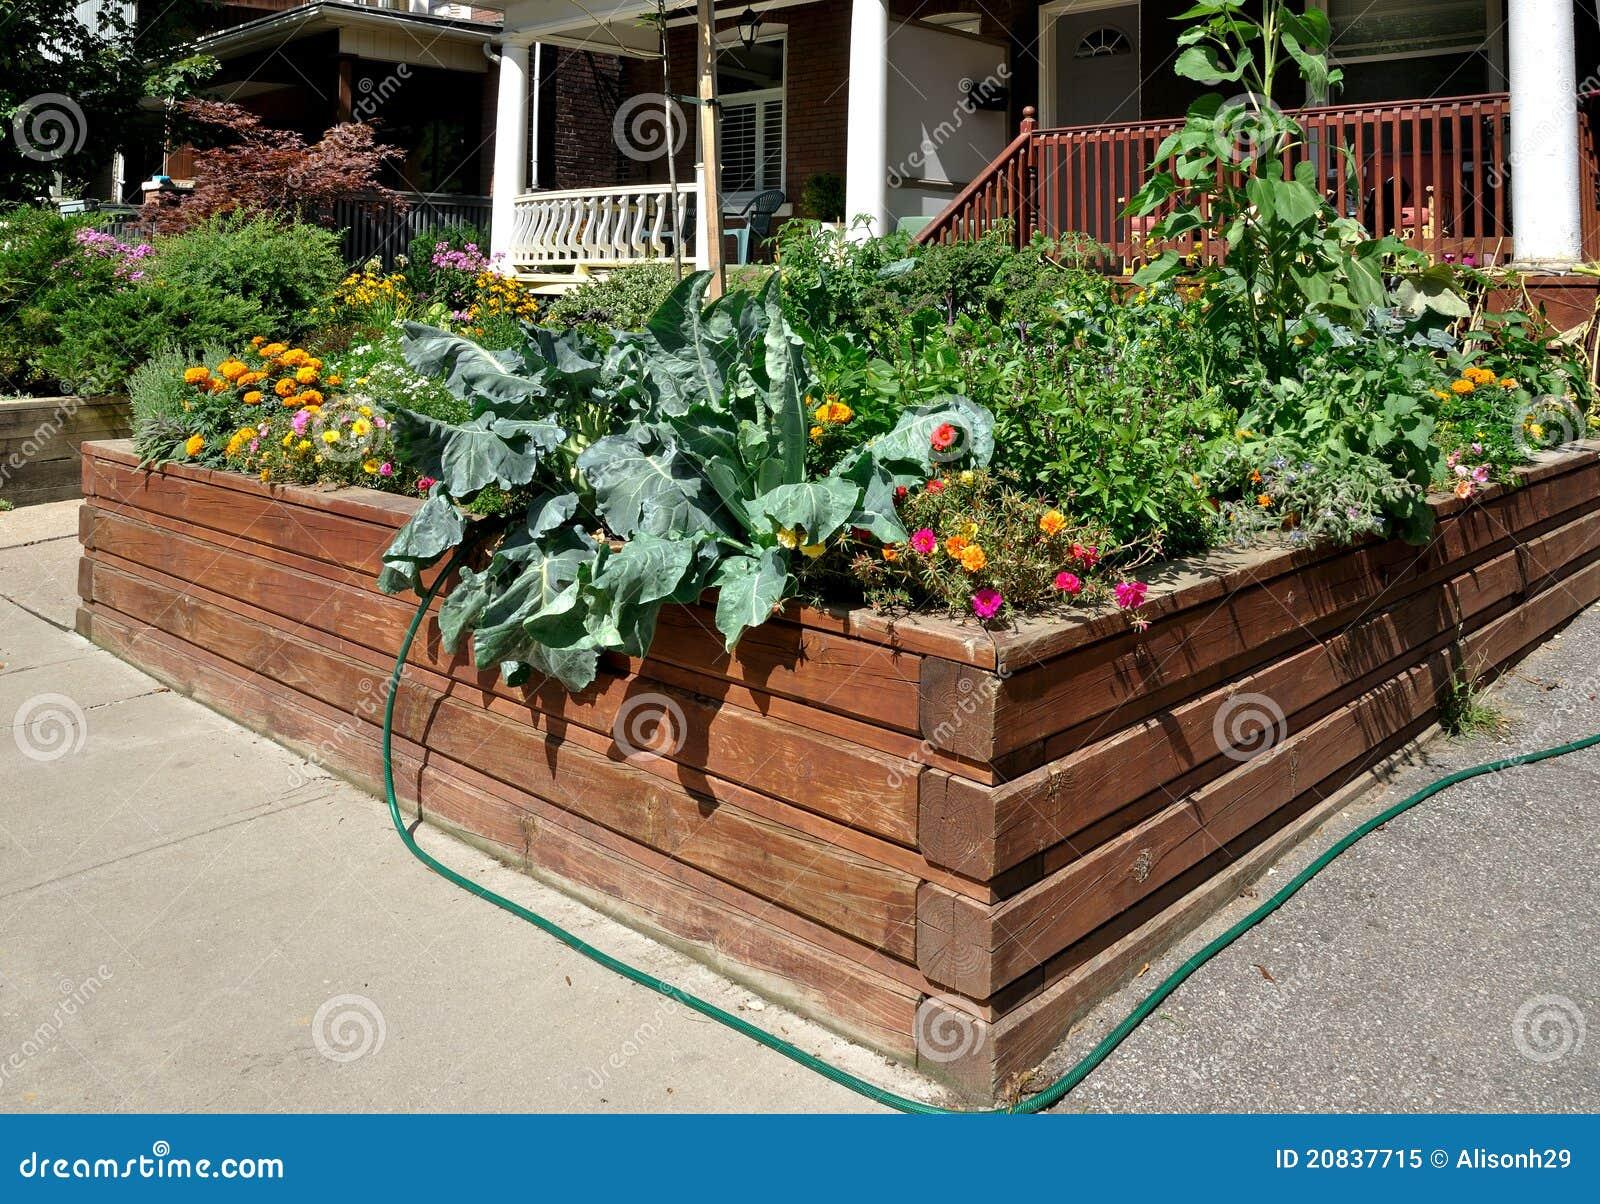 Raised Garden Bed Stock Image Image Of Ecology Ground 20837715